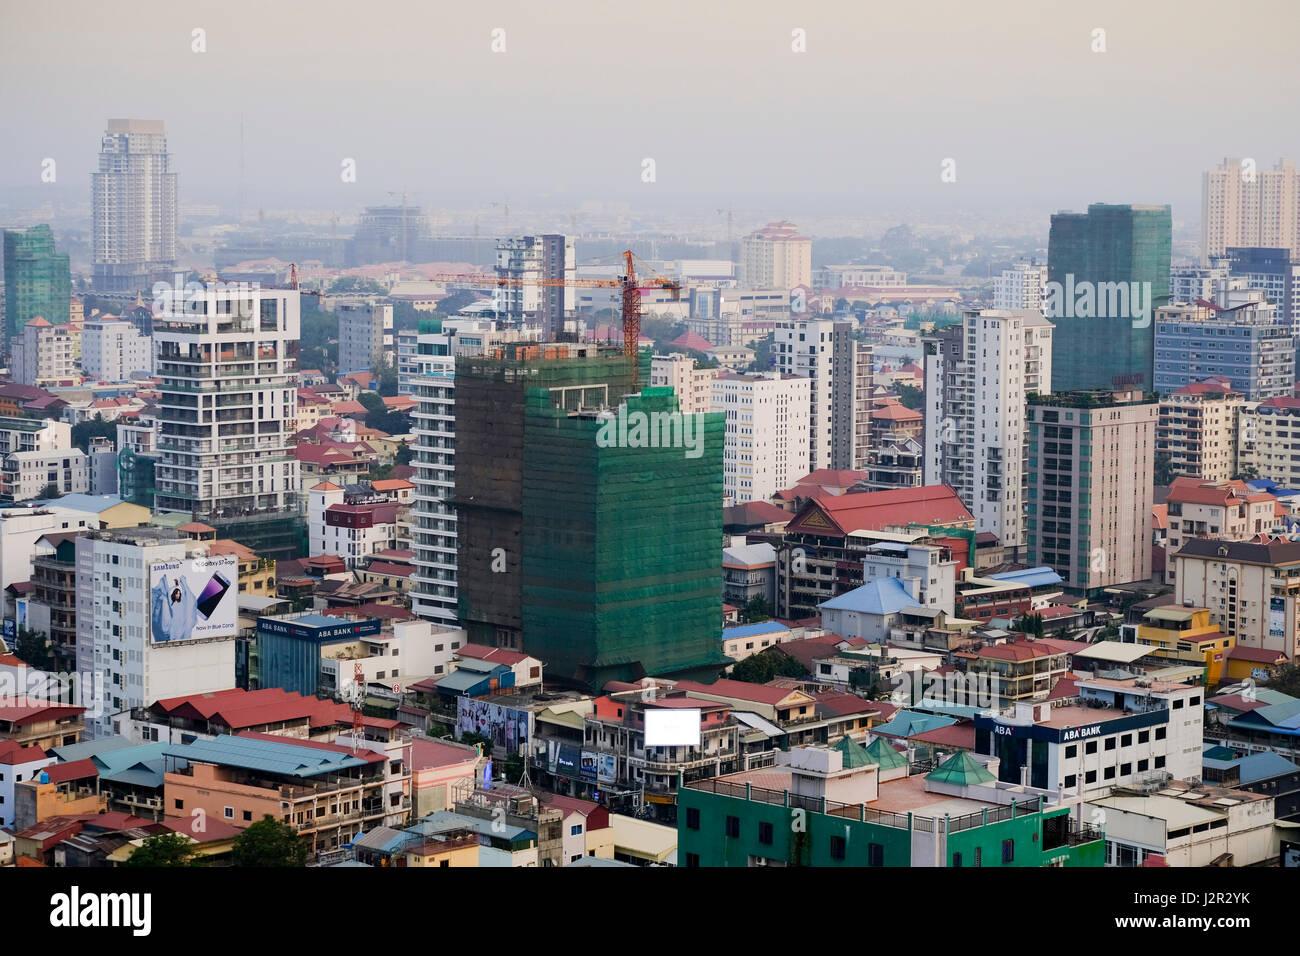 Centre-ville de Phnom Penh et skyline - capitale du Cambodge Photo Stock